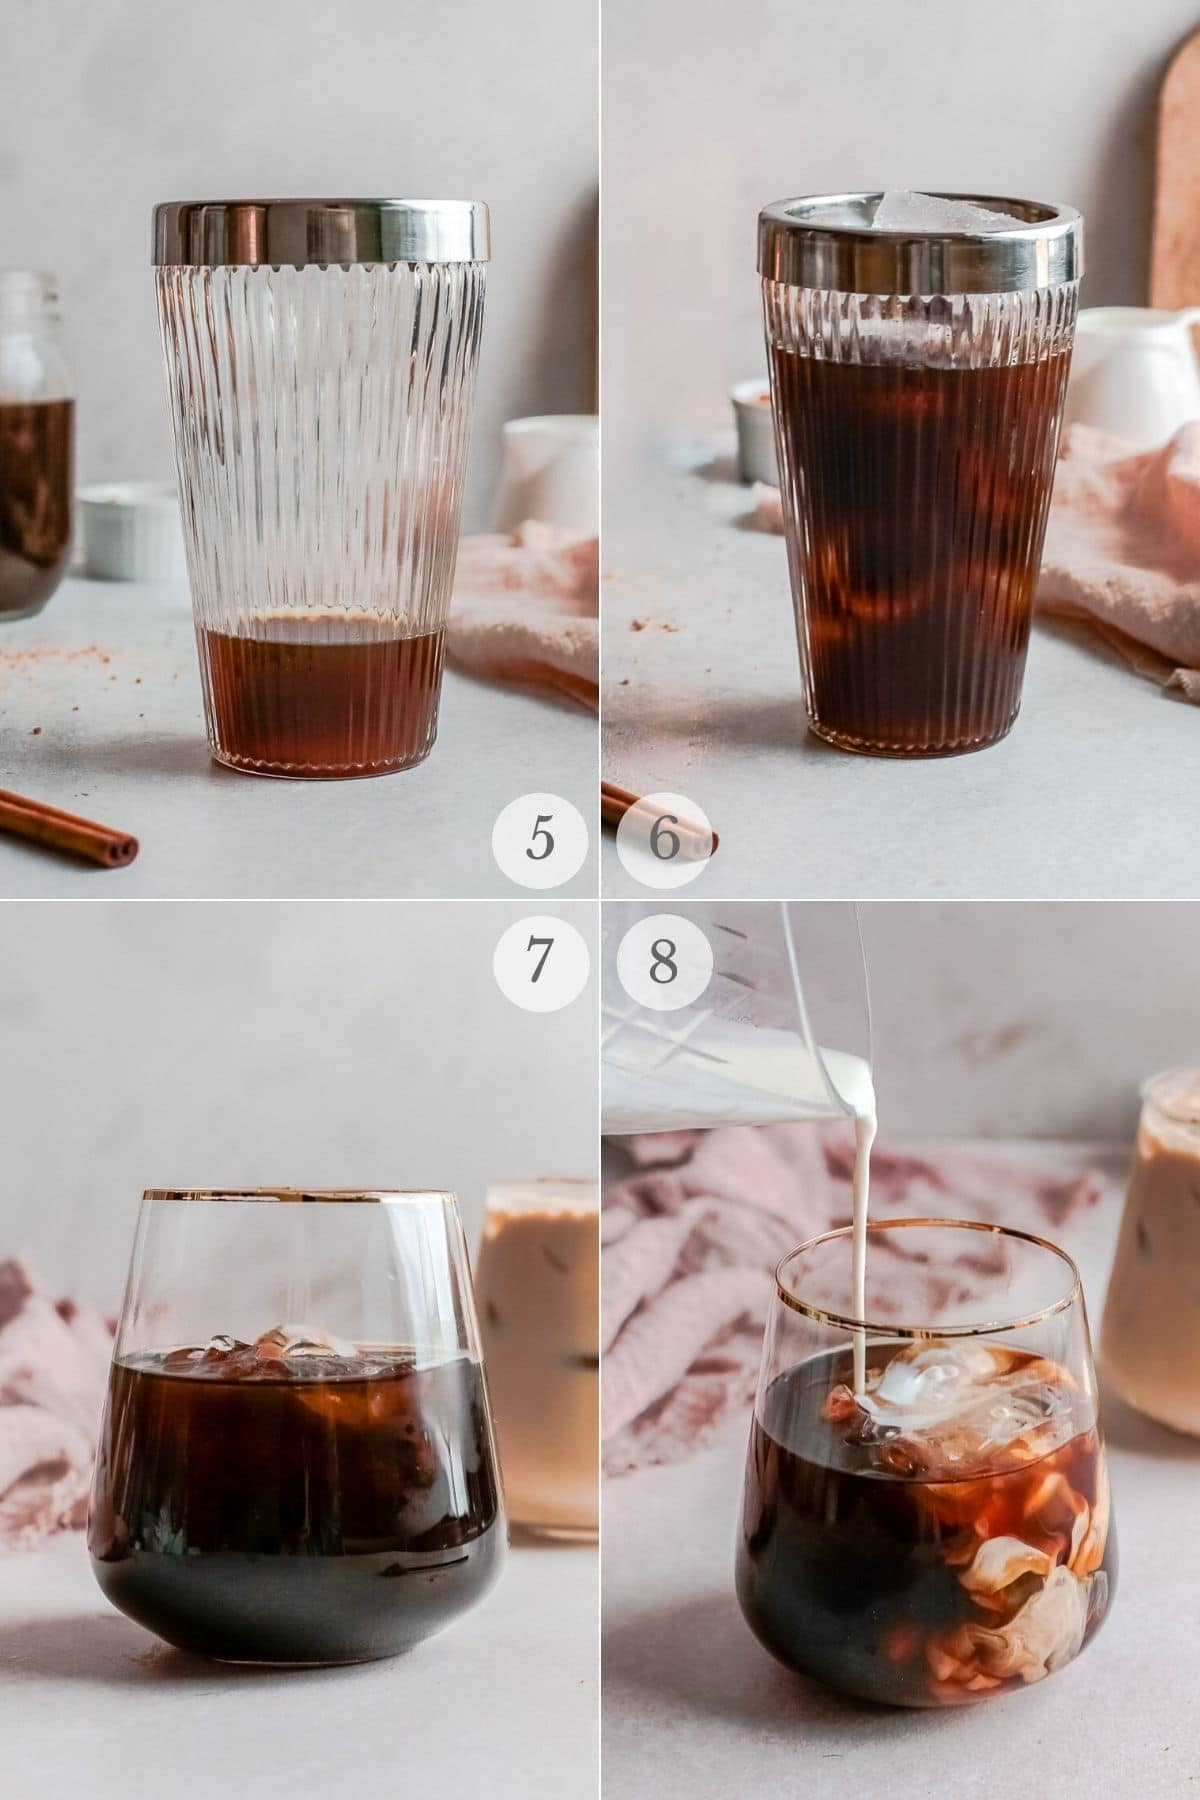 shaken espresso recipe steps 5-8